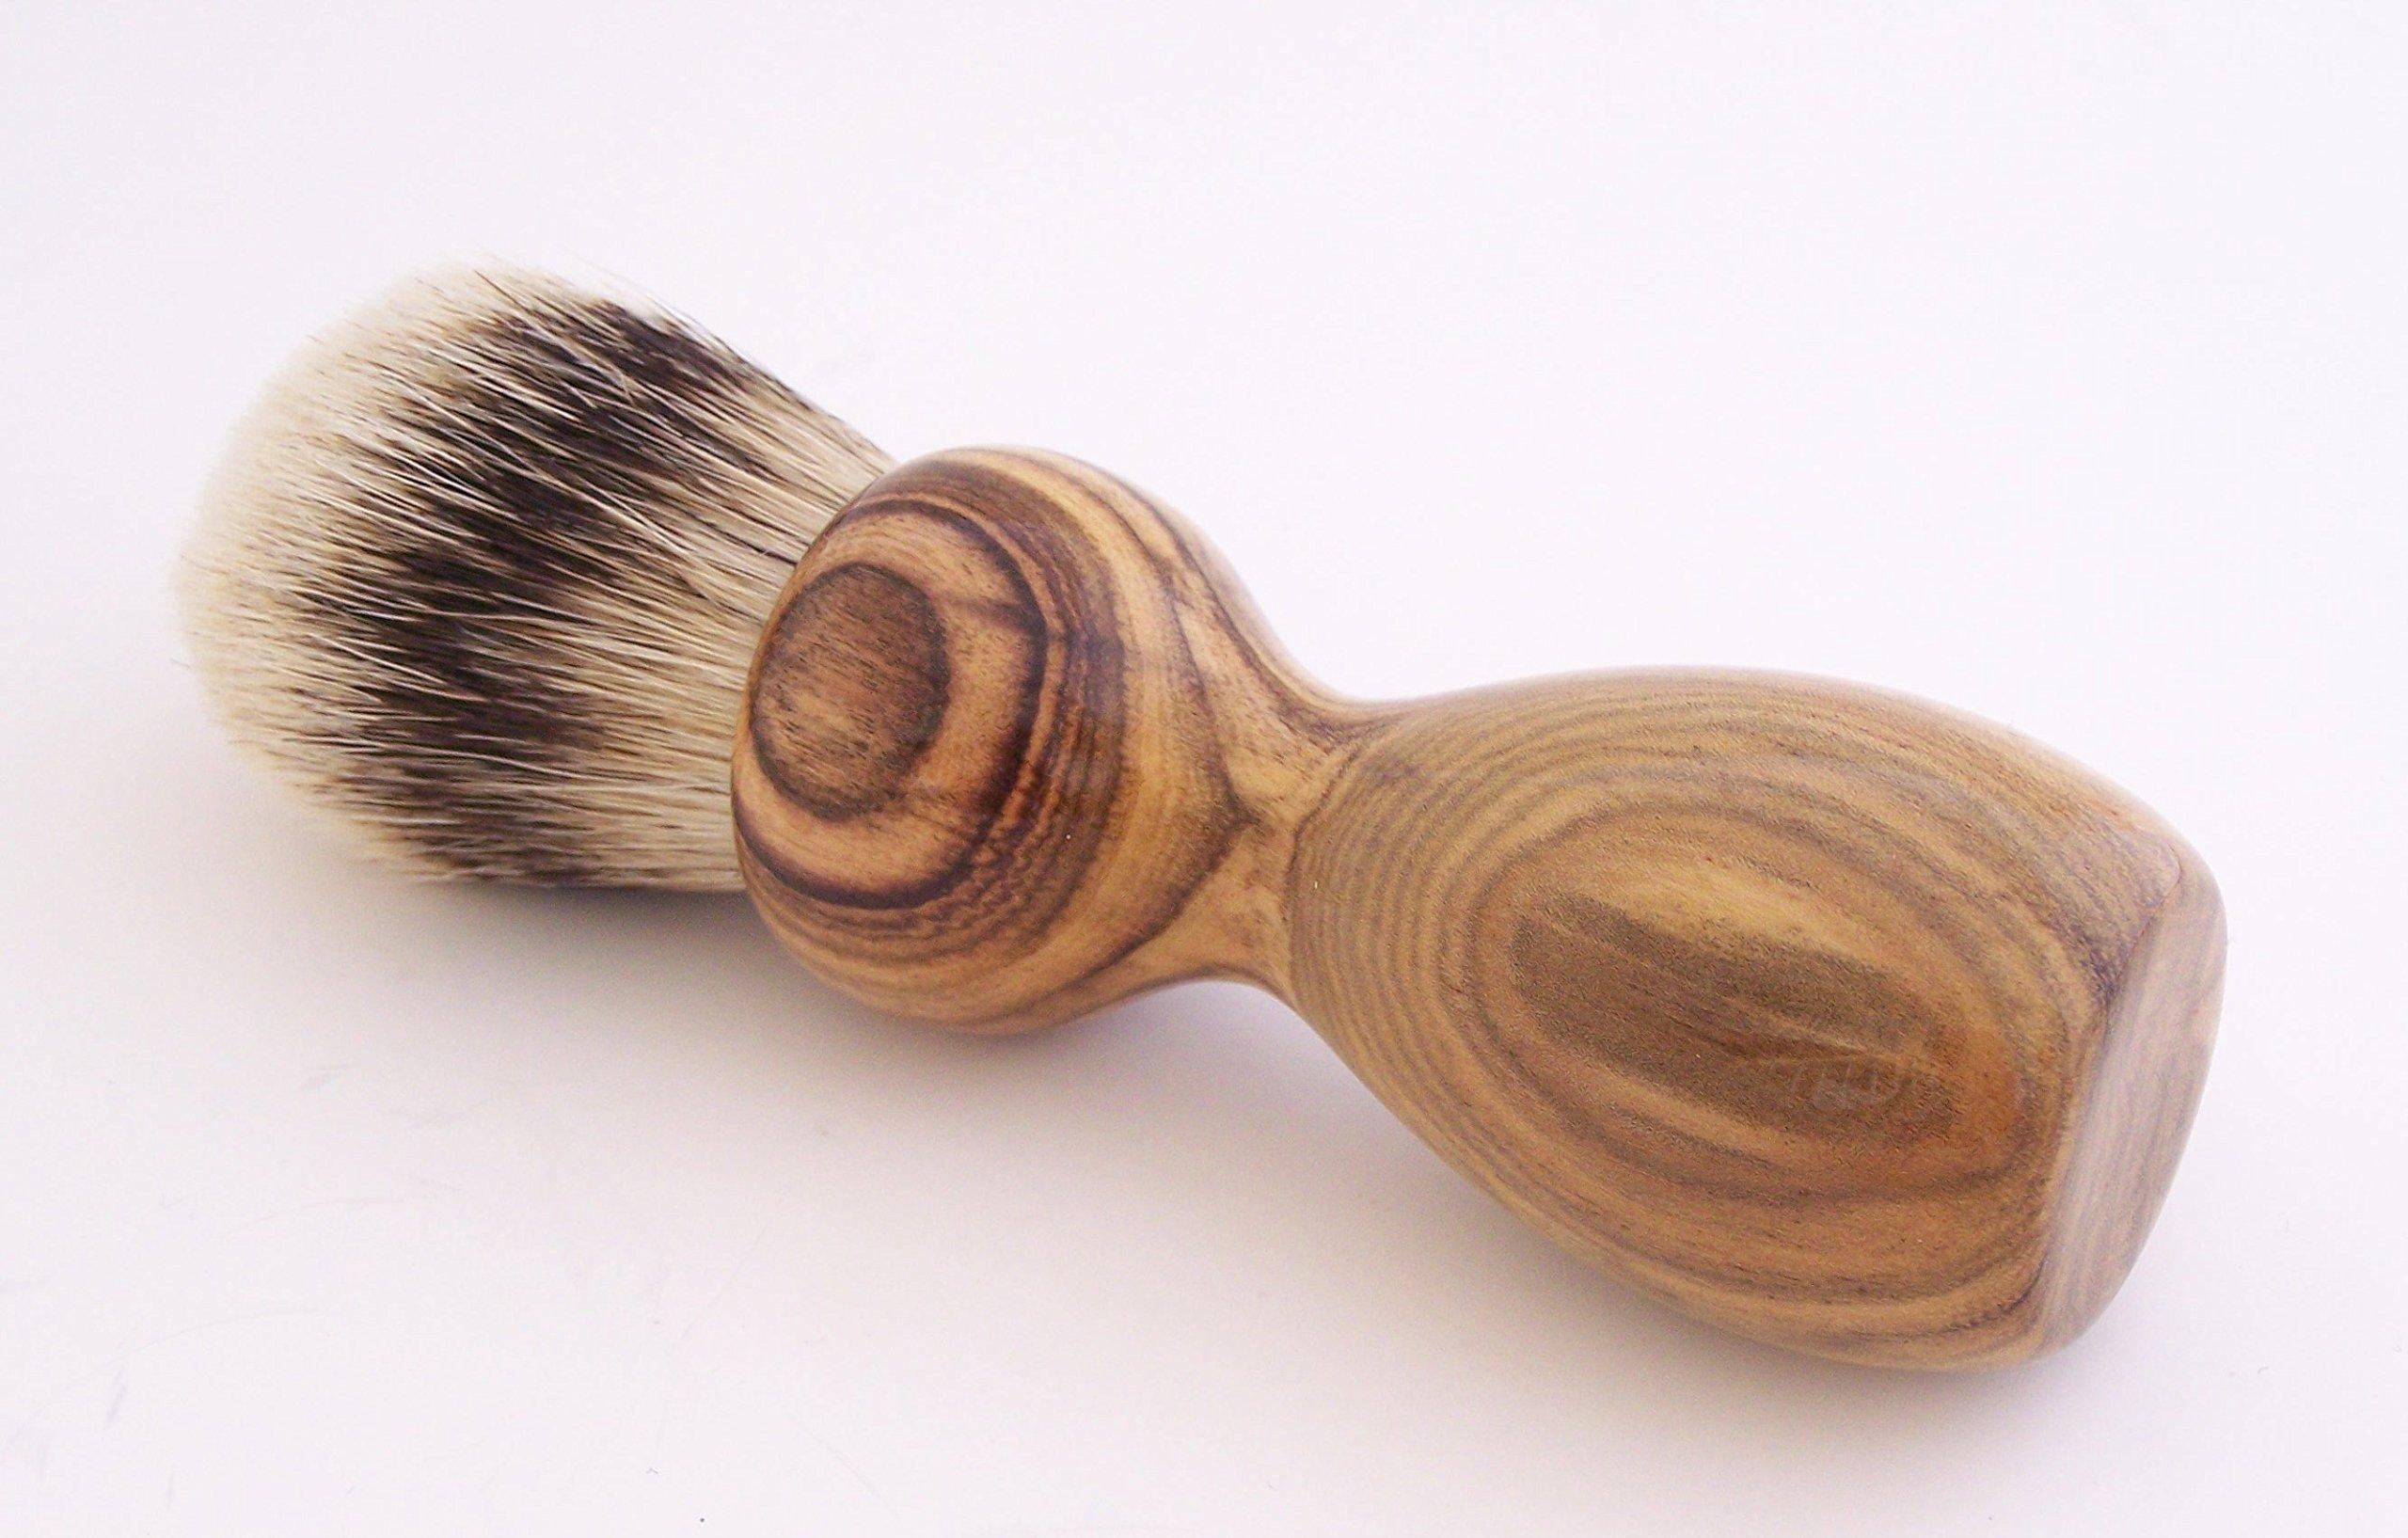 Pistachio Wood 24mm Super Silvertip Shaving Brush (P1)